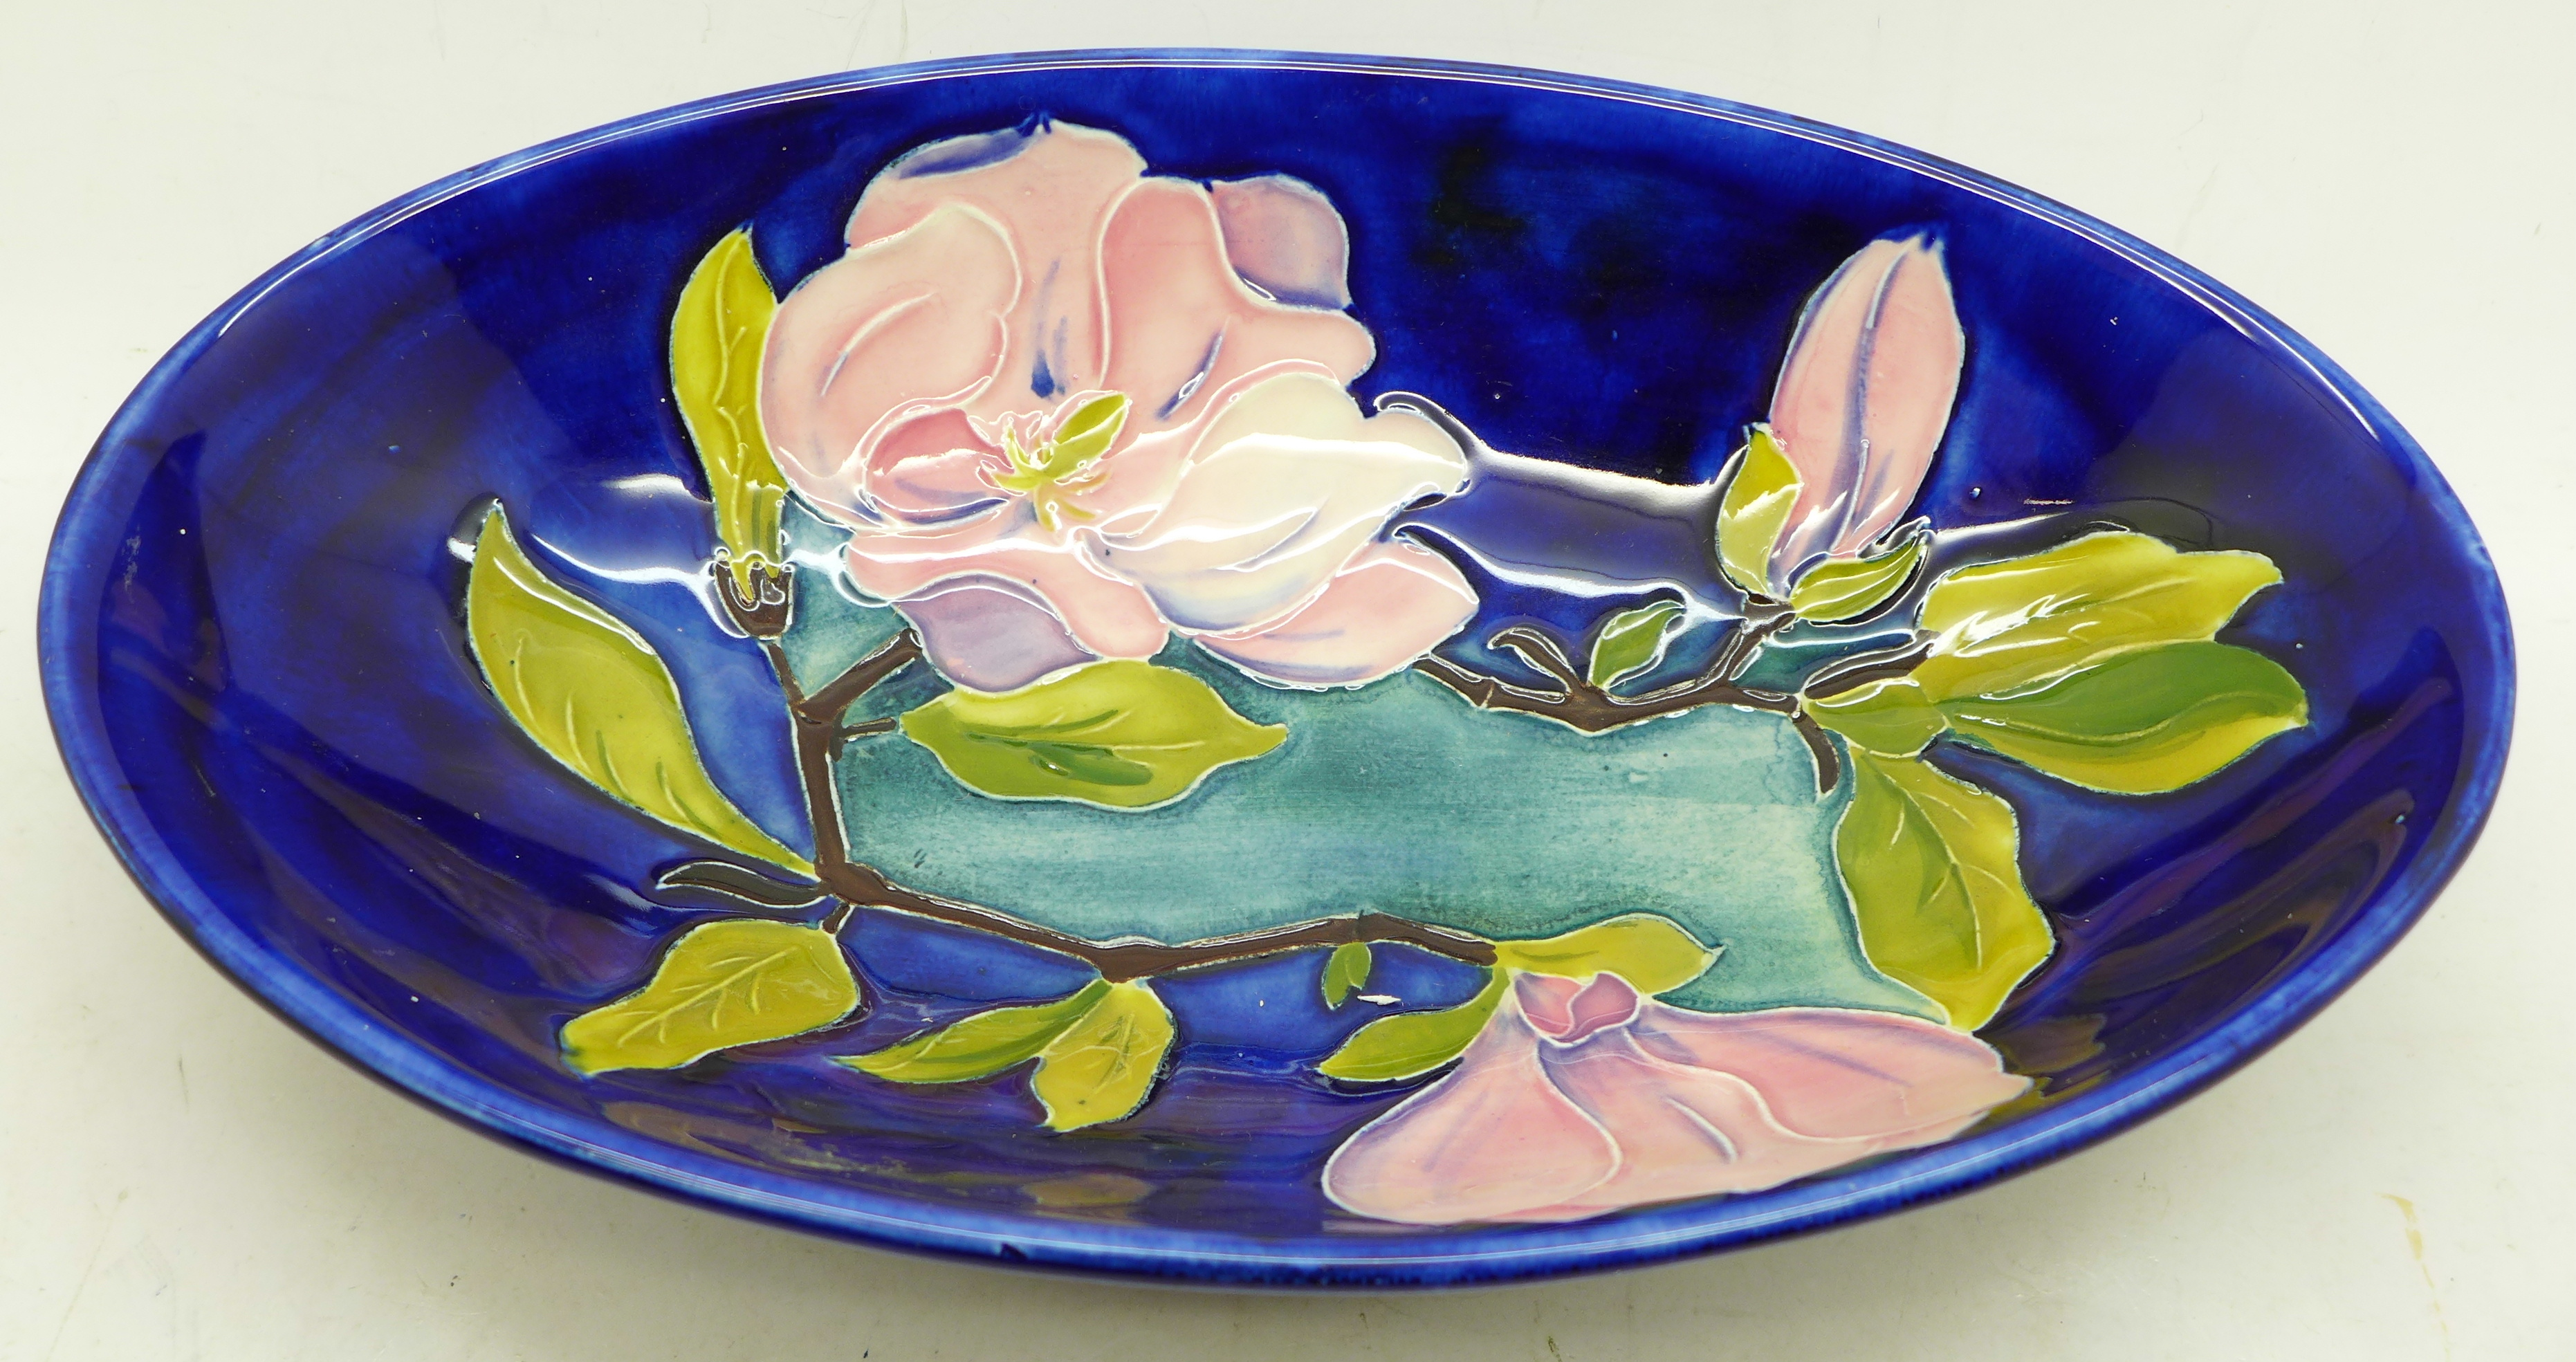 A Moorcroft magnolia oval dish, 23cm - Image 2 of 4